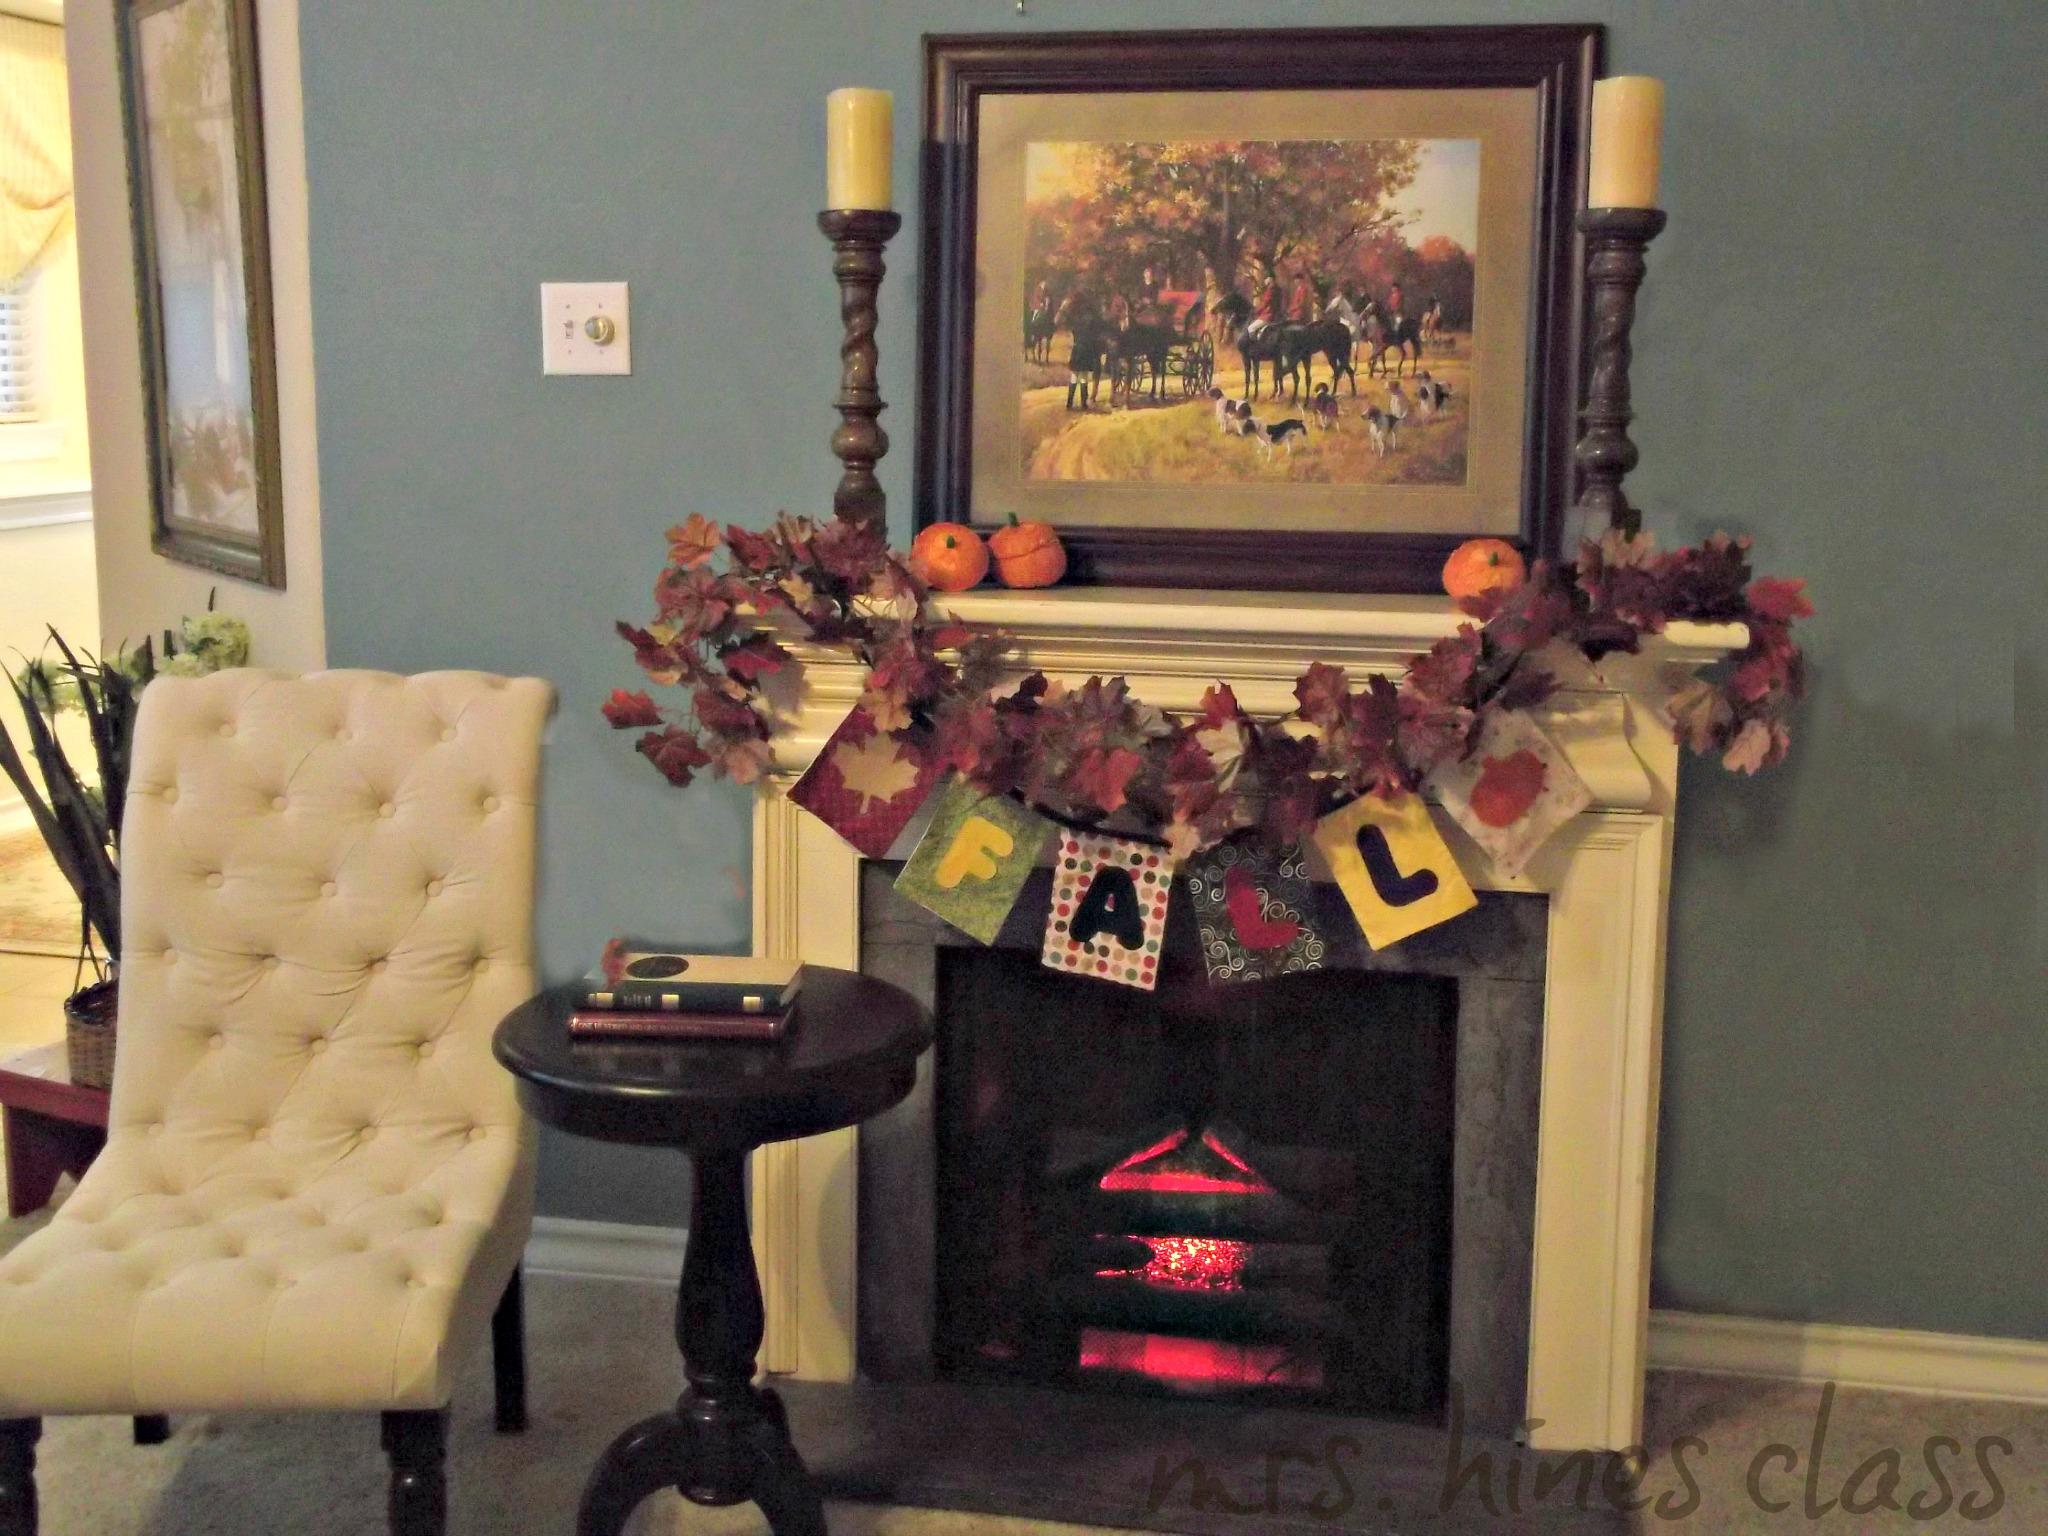 autumn, fall, mantel, decor, vignette, leaf garland, candles, barley twist candle sticks, bunting, pumpkins, rattan